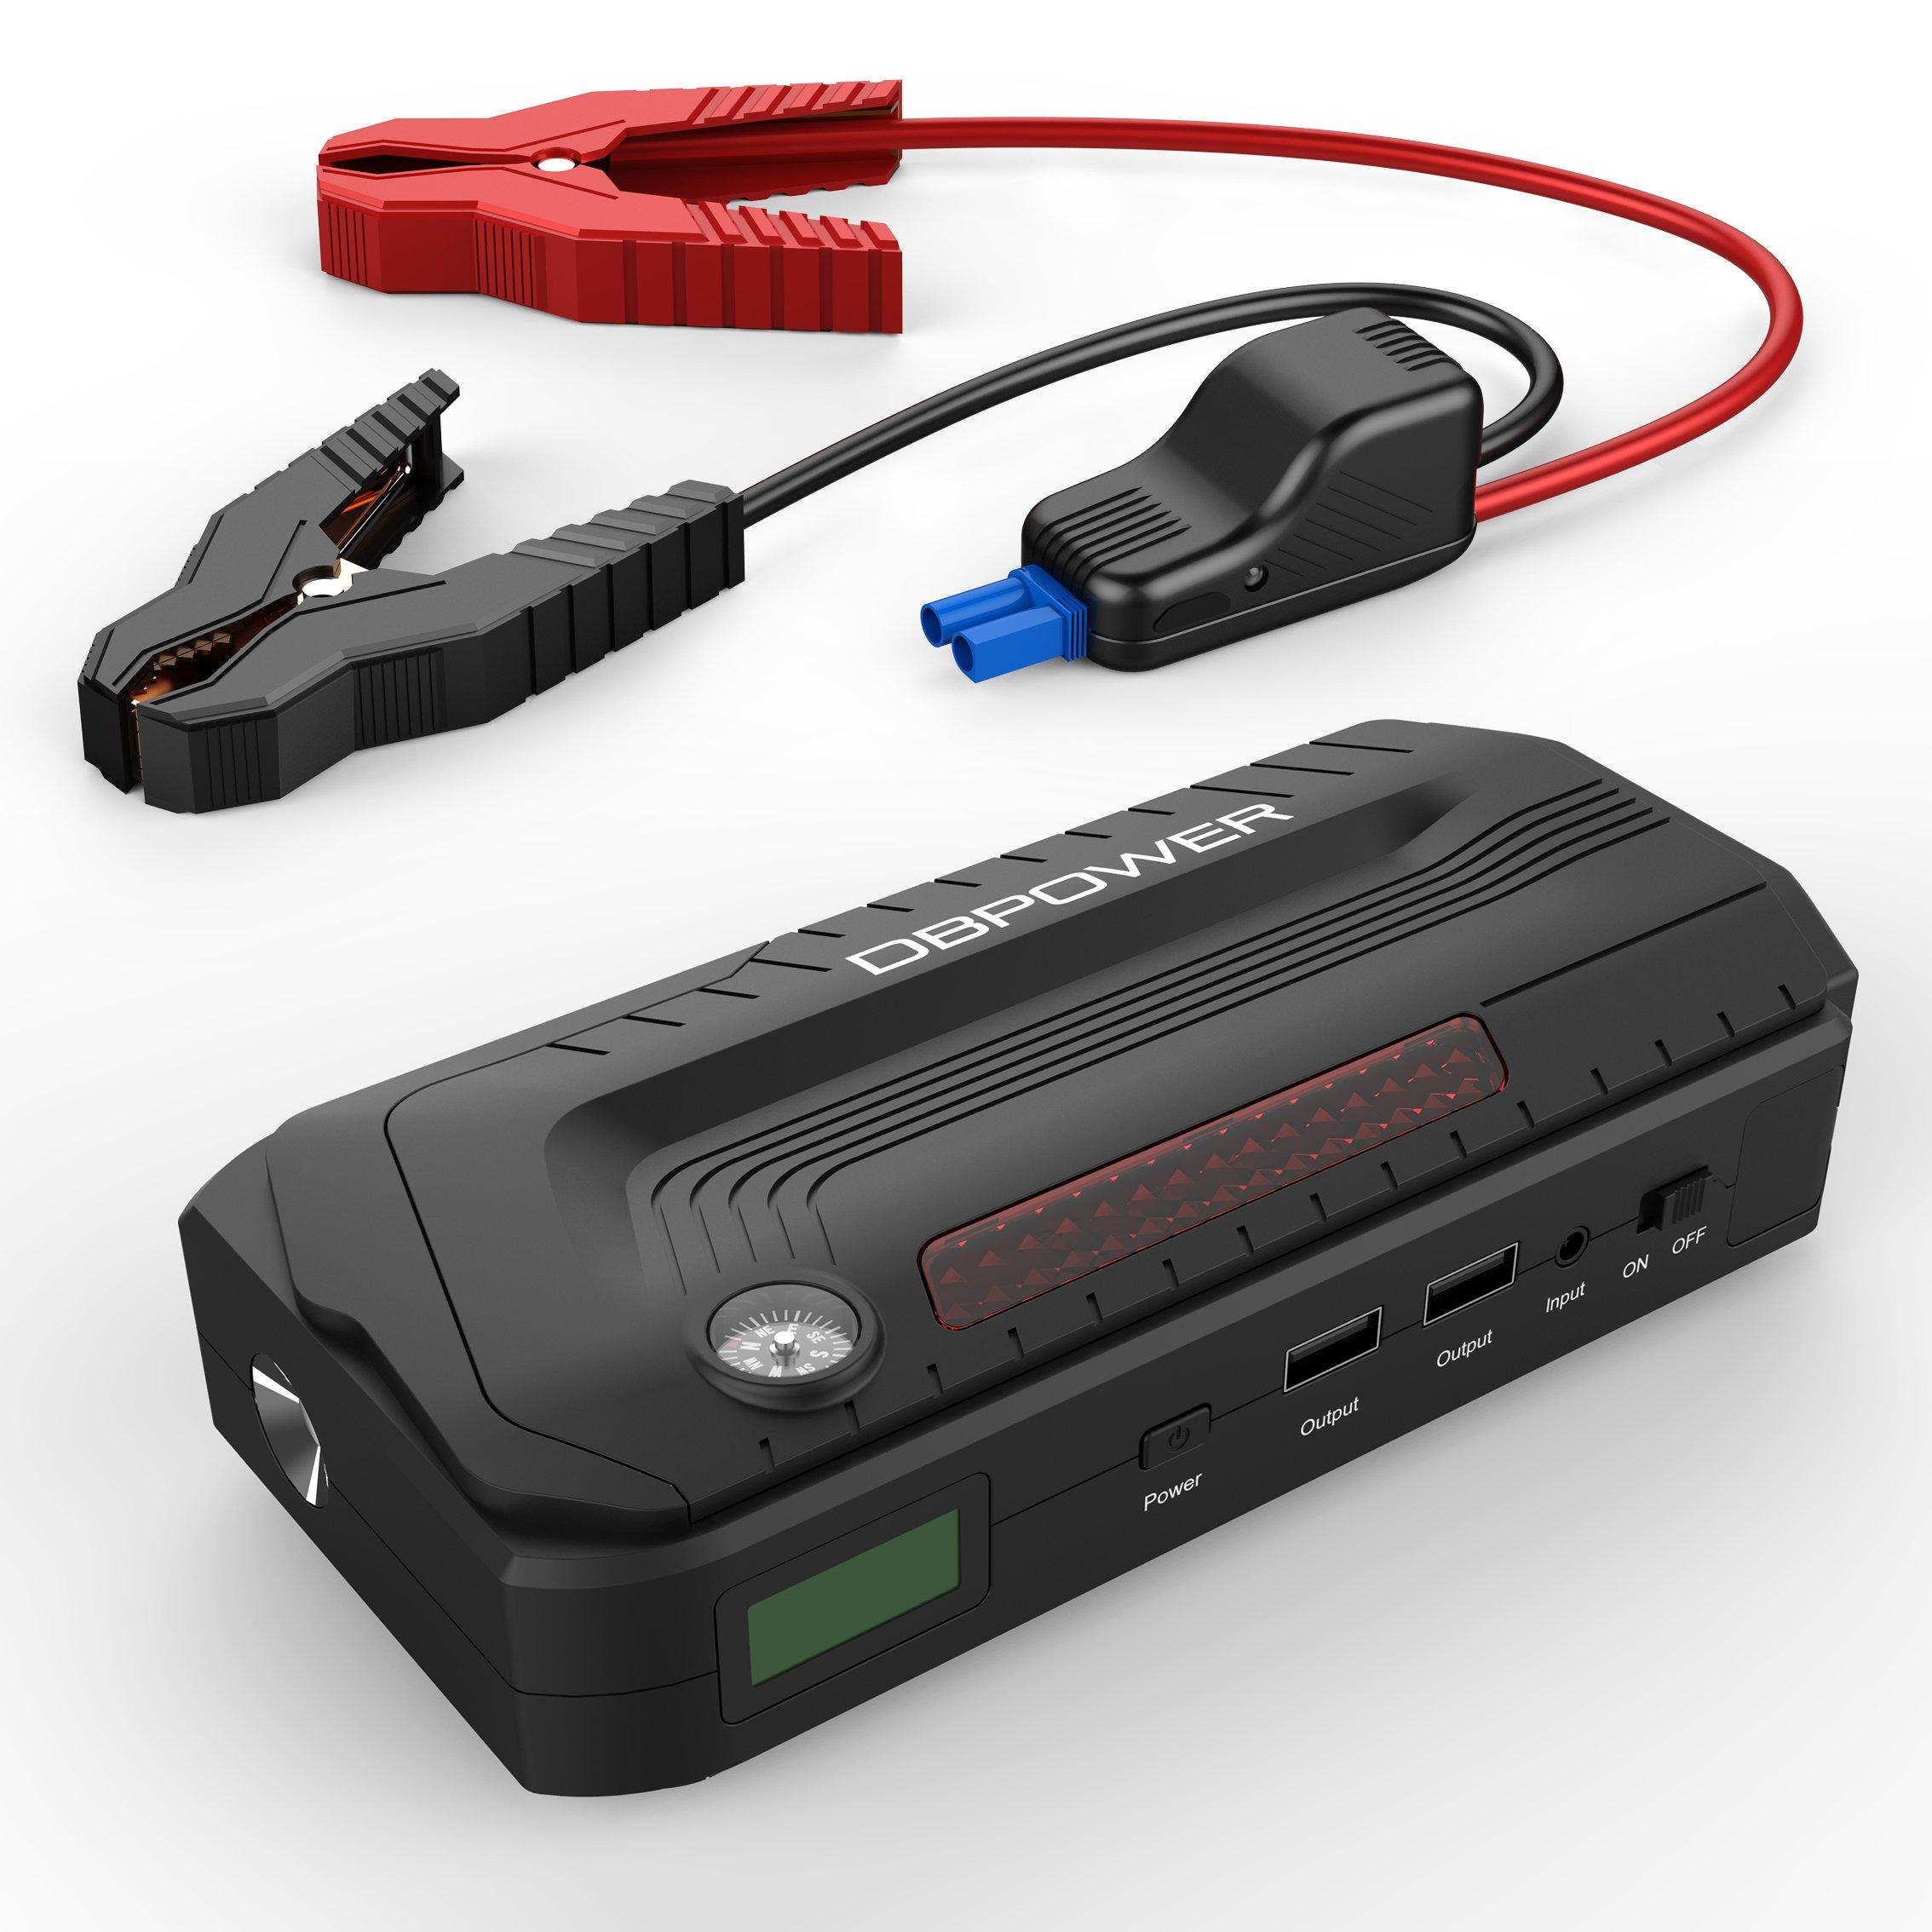 DBPOWER800A Arrancador de batería, 18000mAh, portátil, batería portátil, batería externa, cargador con doble USB de carga, linterna LED y pantalla LCD